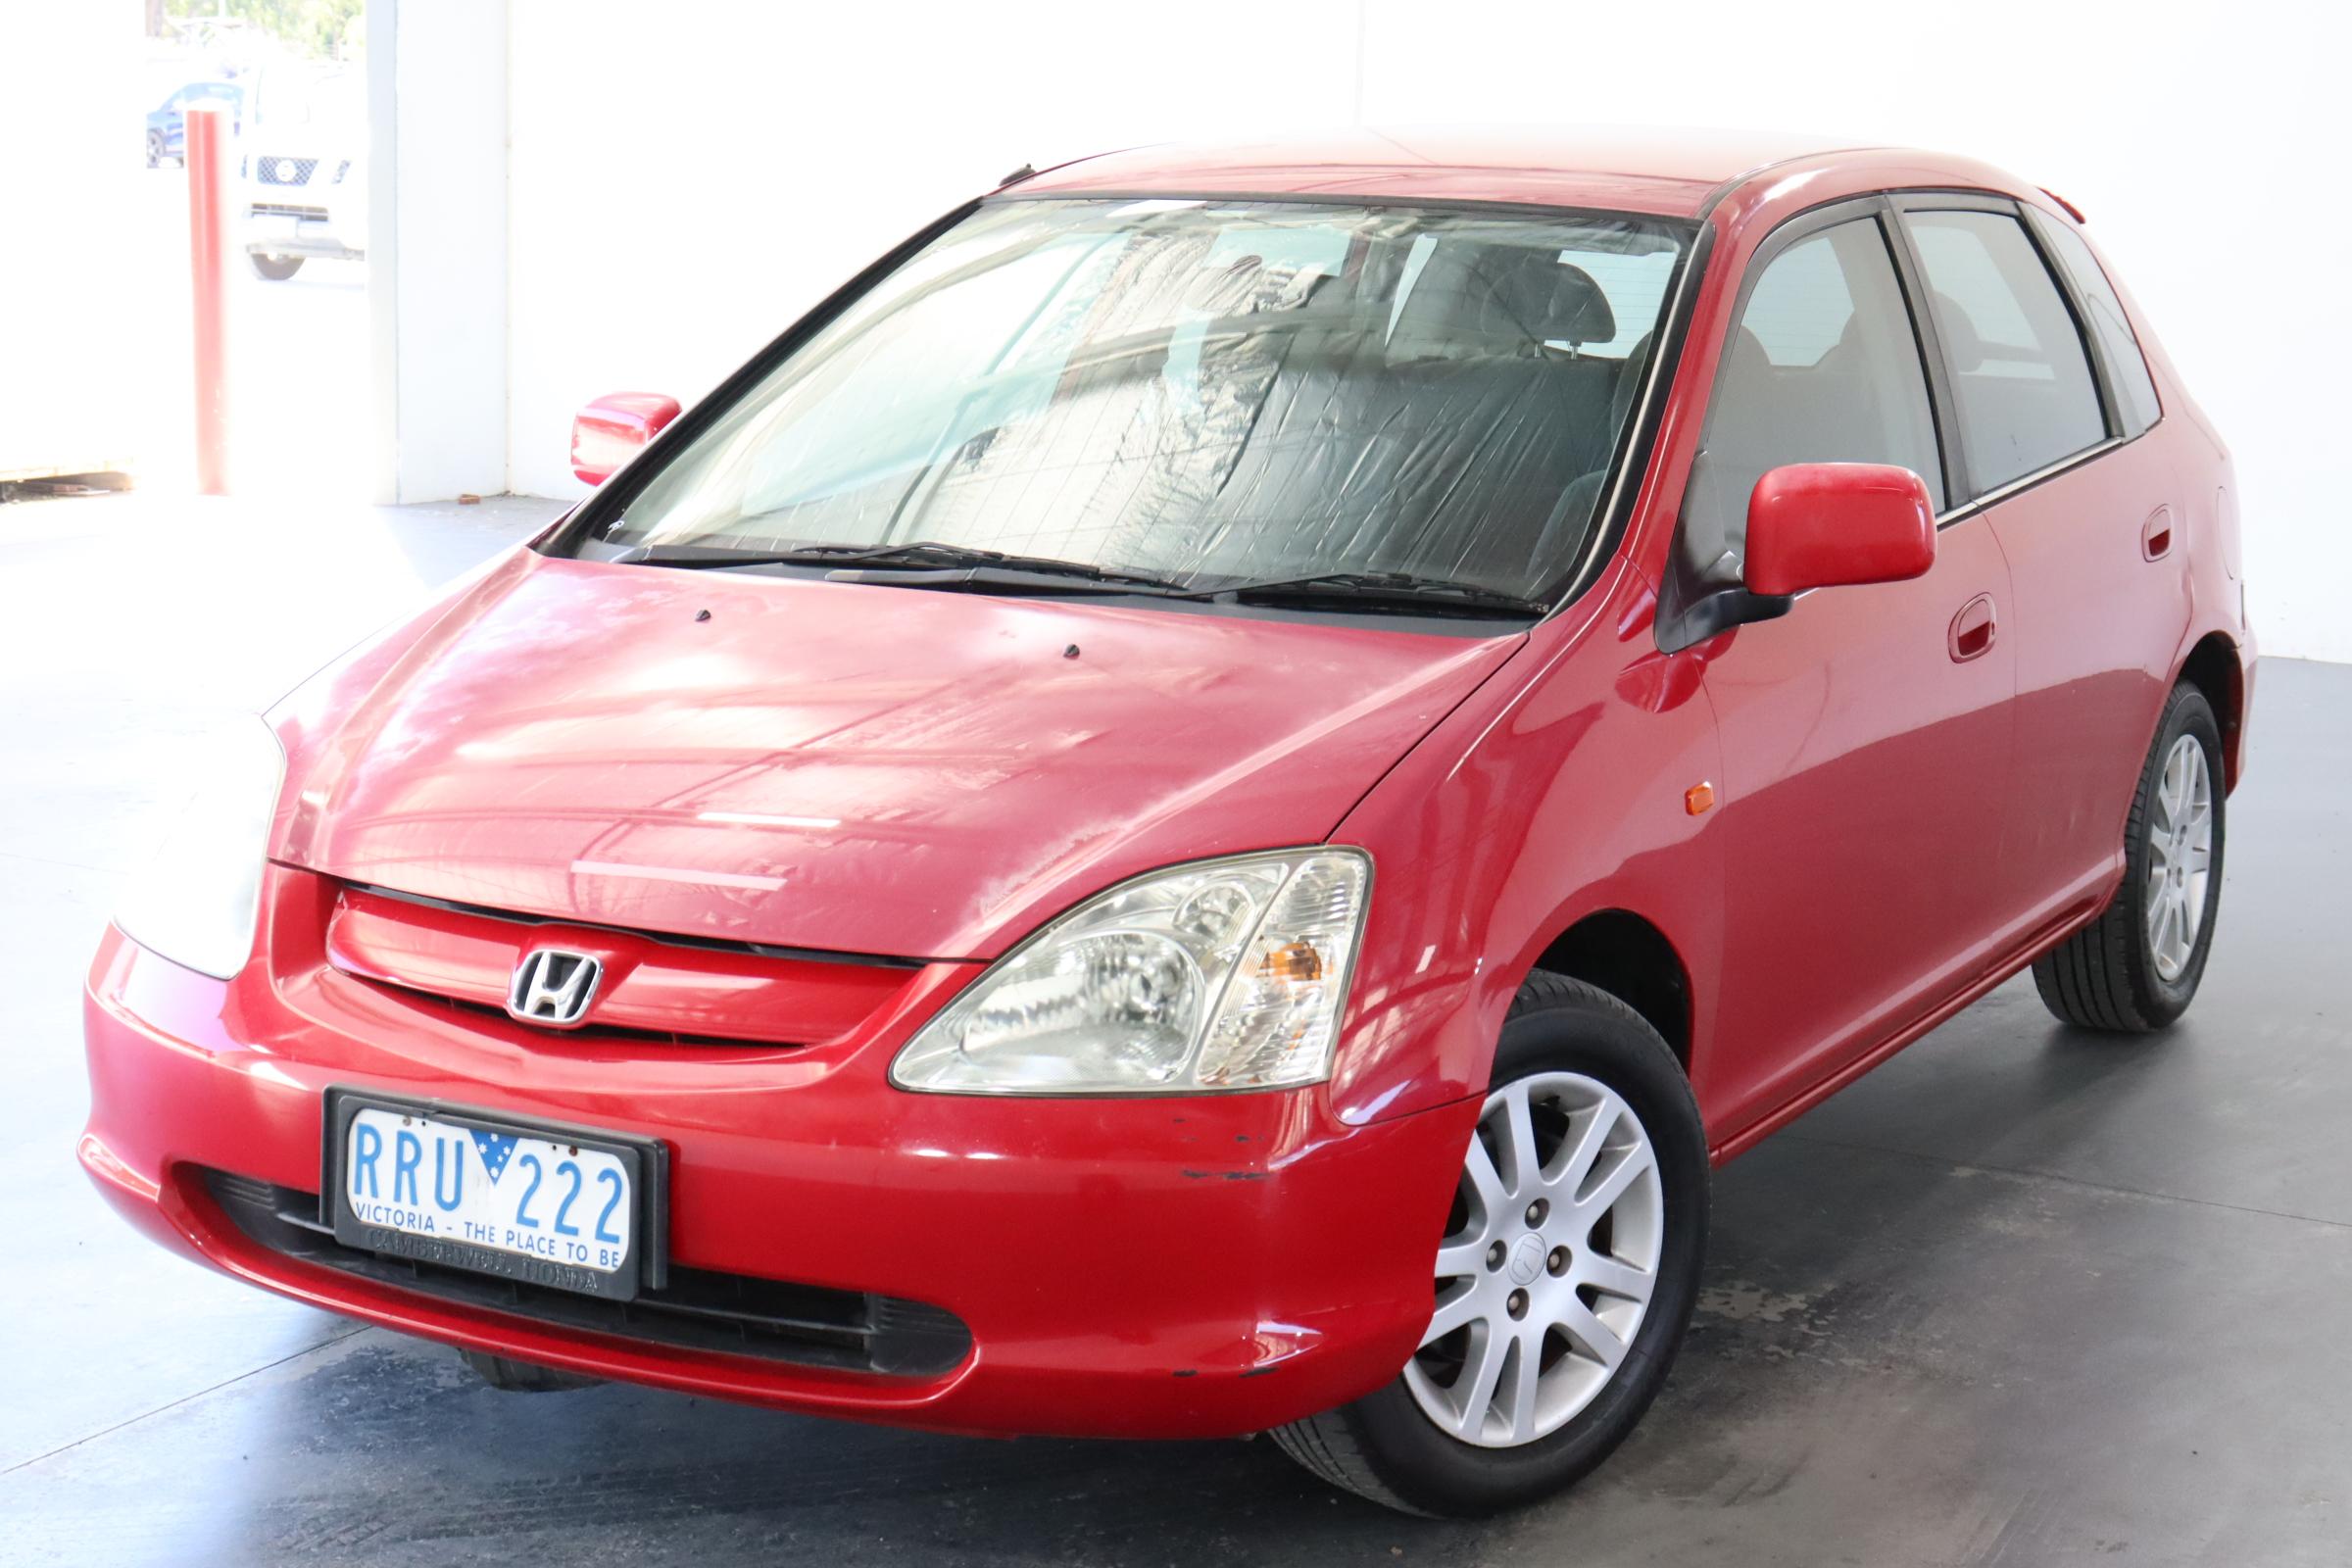 2002 Honda Civic VI 7th Gen Automatic Hatchback